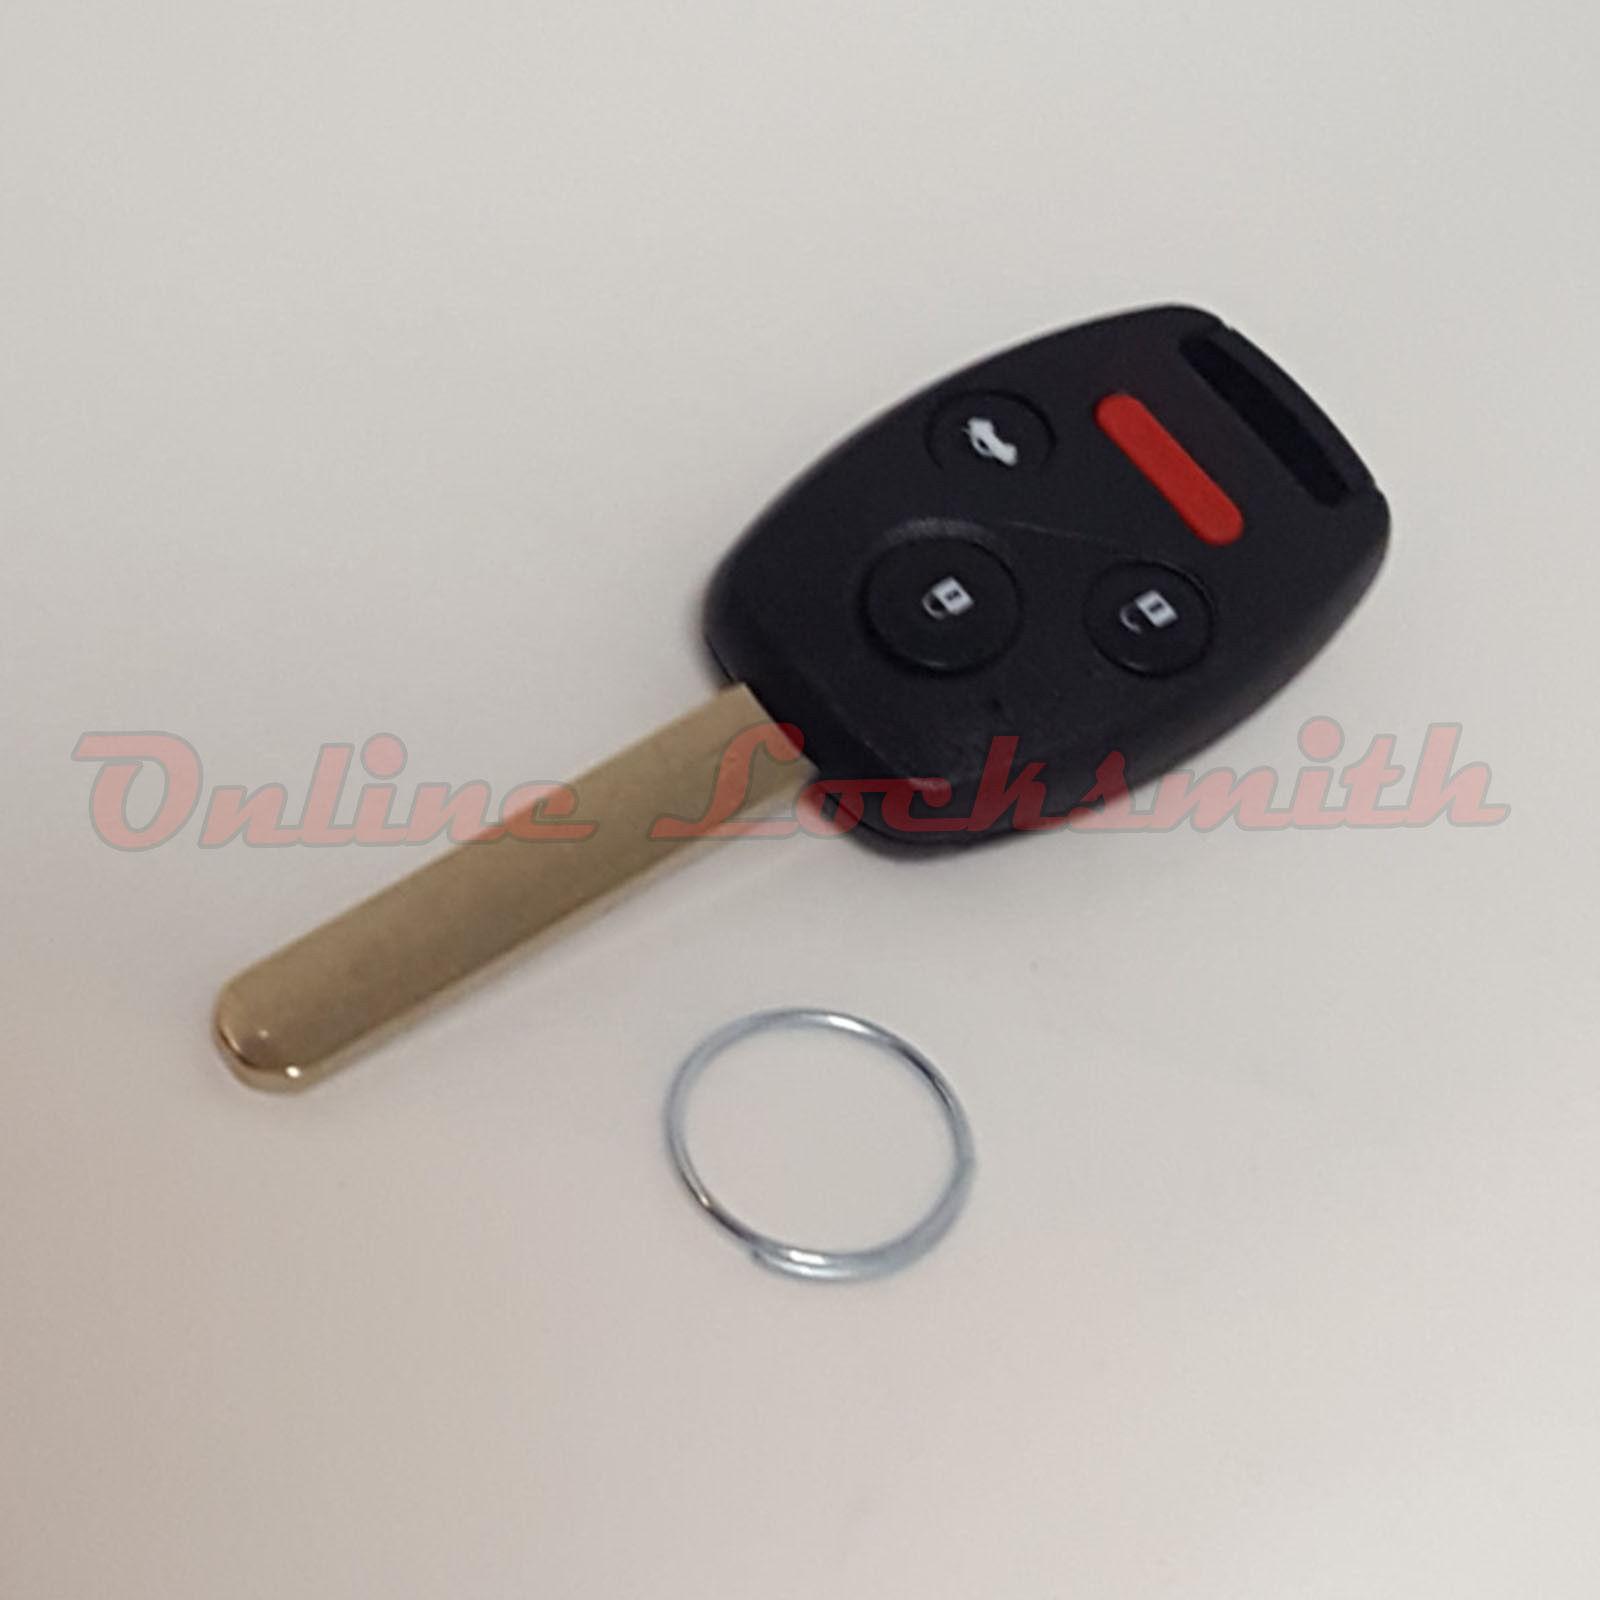 Replacement Honda CR-V 05-06 Remote Key FOB Transmitter